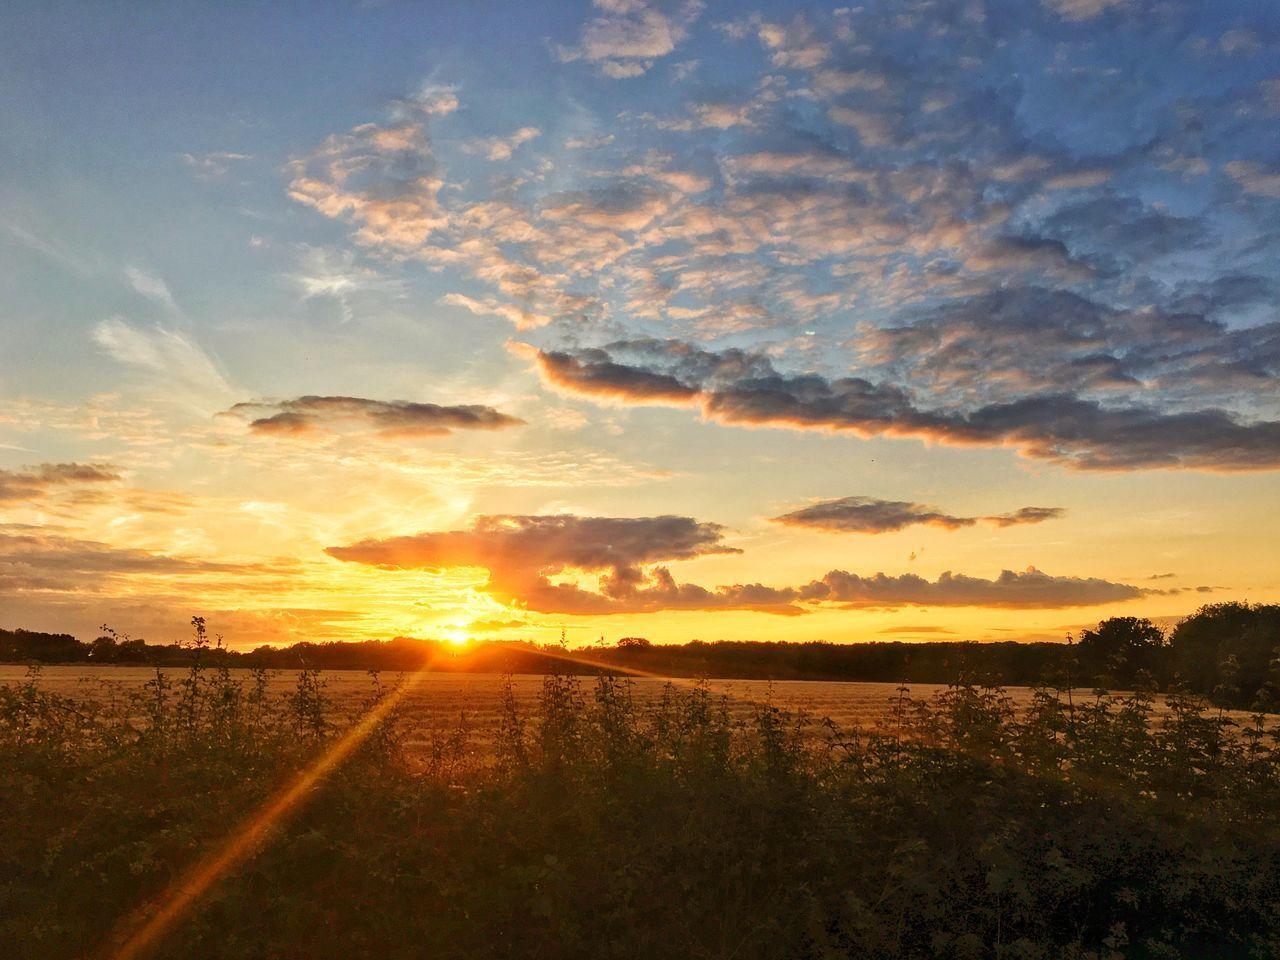 sky, sunset, cloud - sky, scenics - nature, beauty in nature, tranquil scene, tranquility, landscape, environment, nature, sunlight, sun, no people, orange color, field, idyllic, land, non-urban scene, plant, sunbeam, outdoors, lens flare, bright